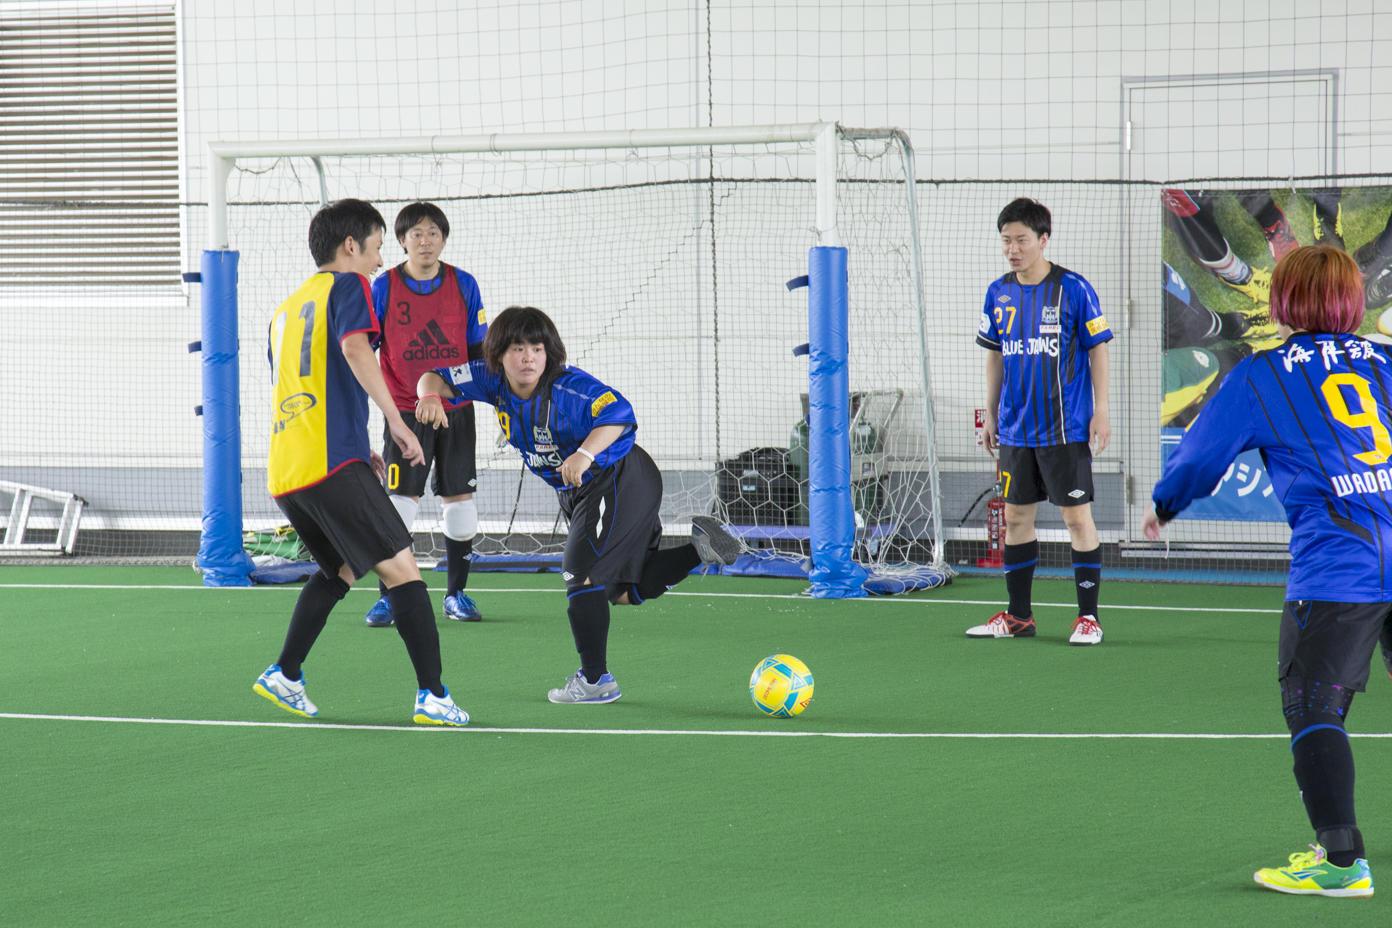 http://news.yoshimoto.co.jp/20170802174357-7fc69156a53c01b078e4953738034b590ec9d08e.jpg